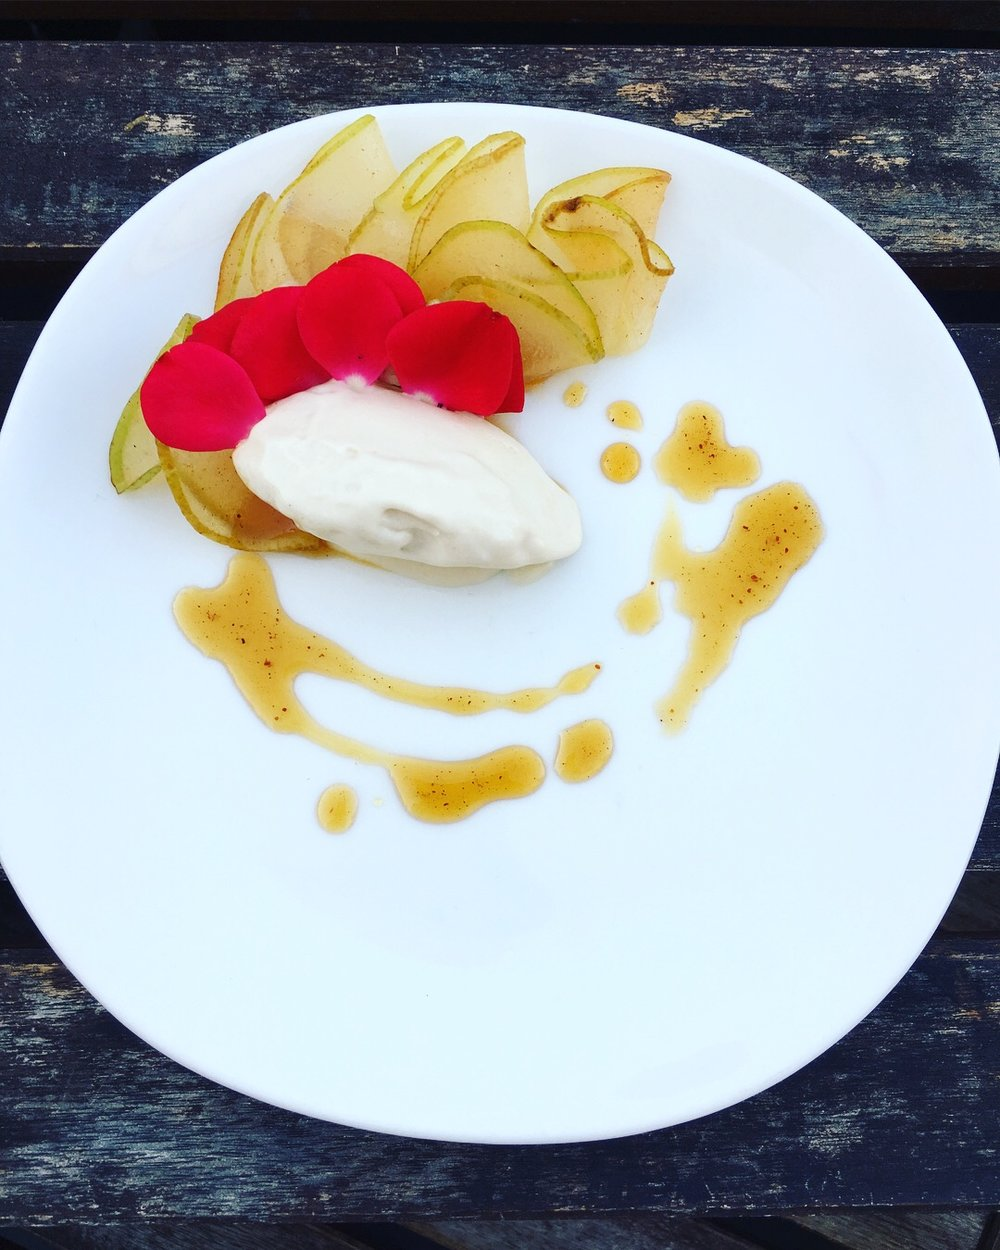 Homemade coconut vanilla ice cream with marinated pears